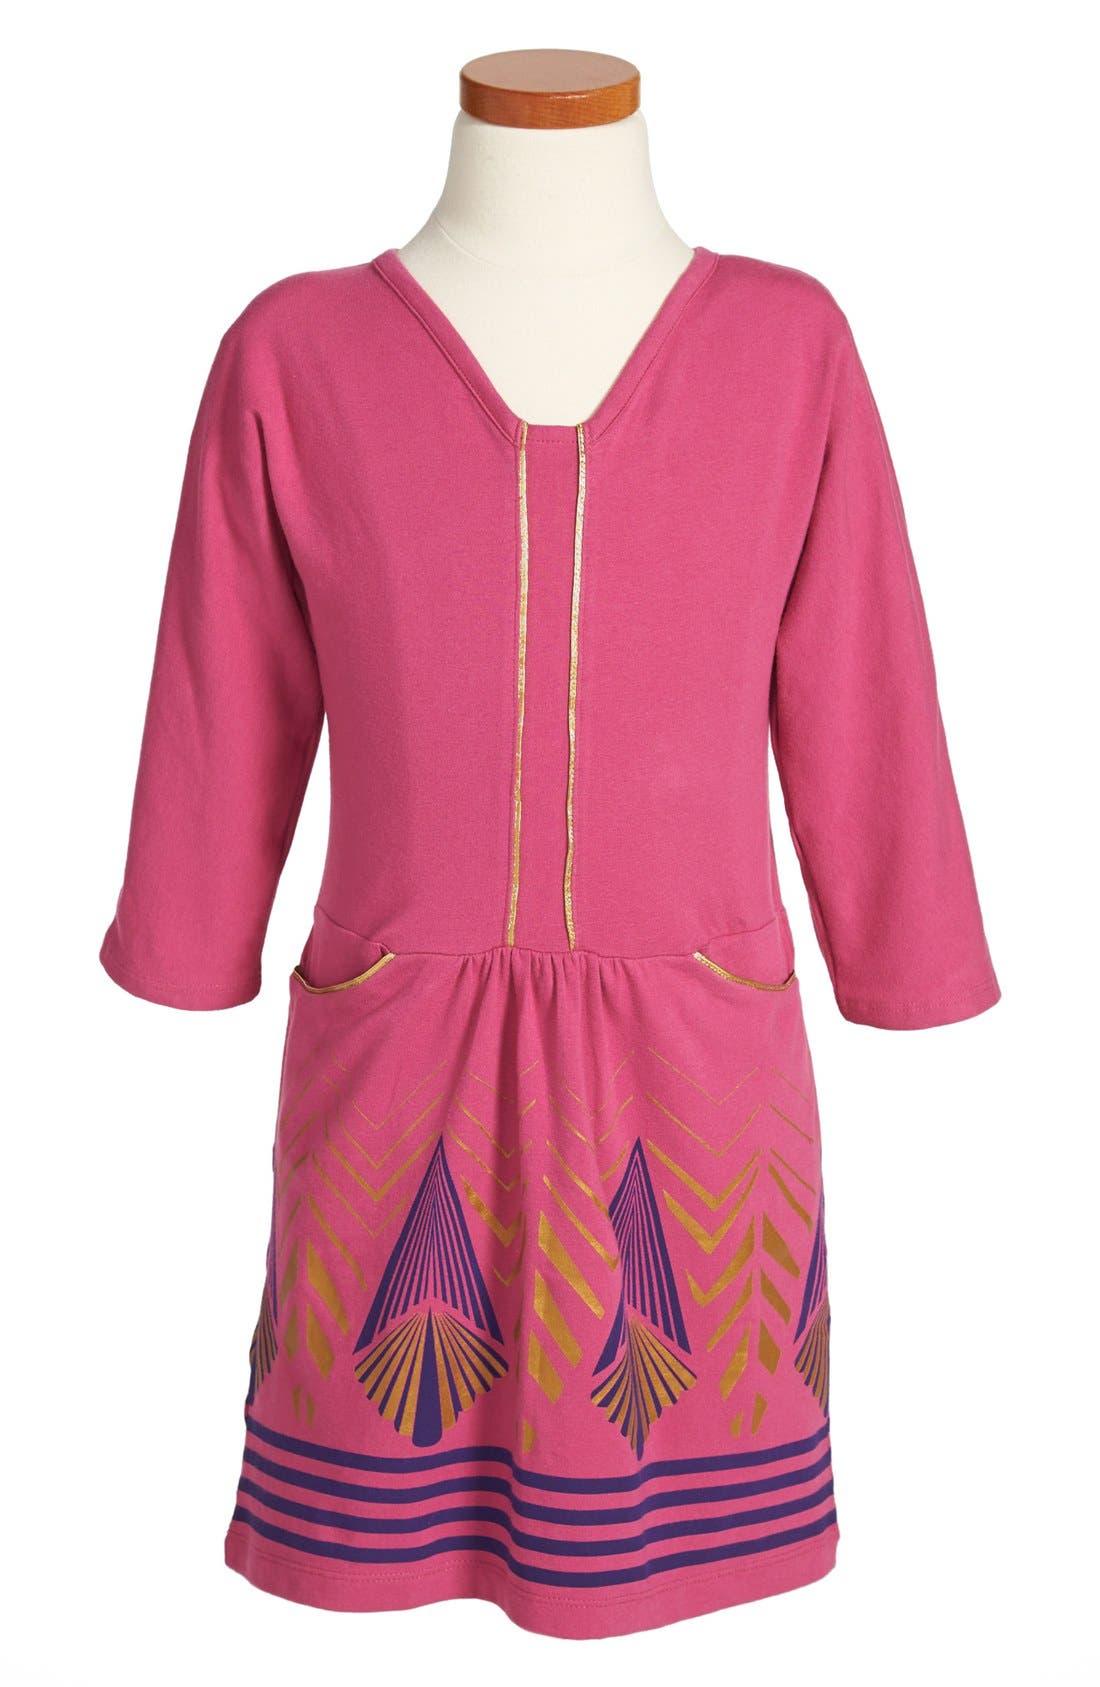 Alternate Image 1 Selected - Tea Collection 'Shanghai Deco' Dress (Little Girls & Big Girls)